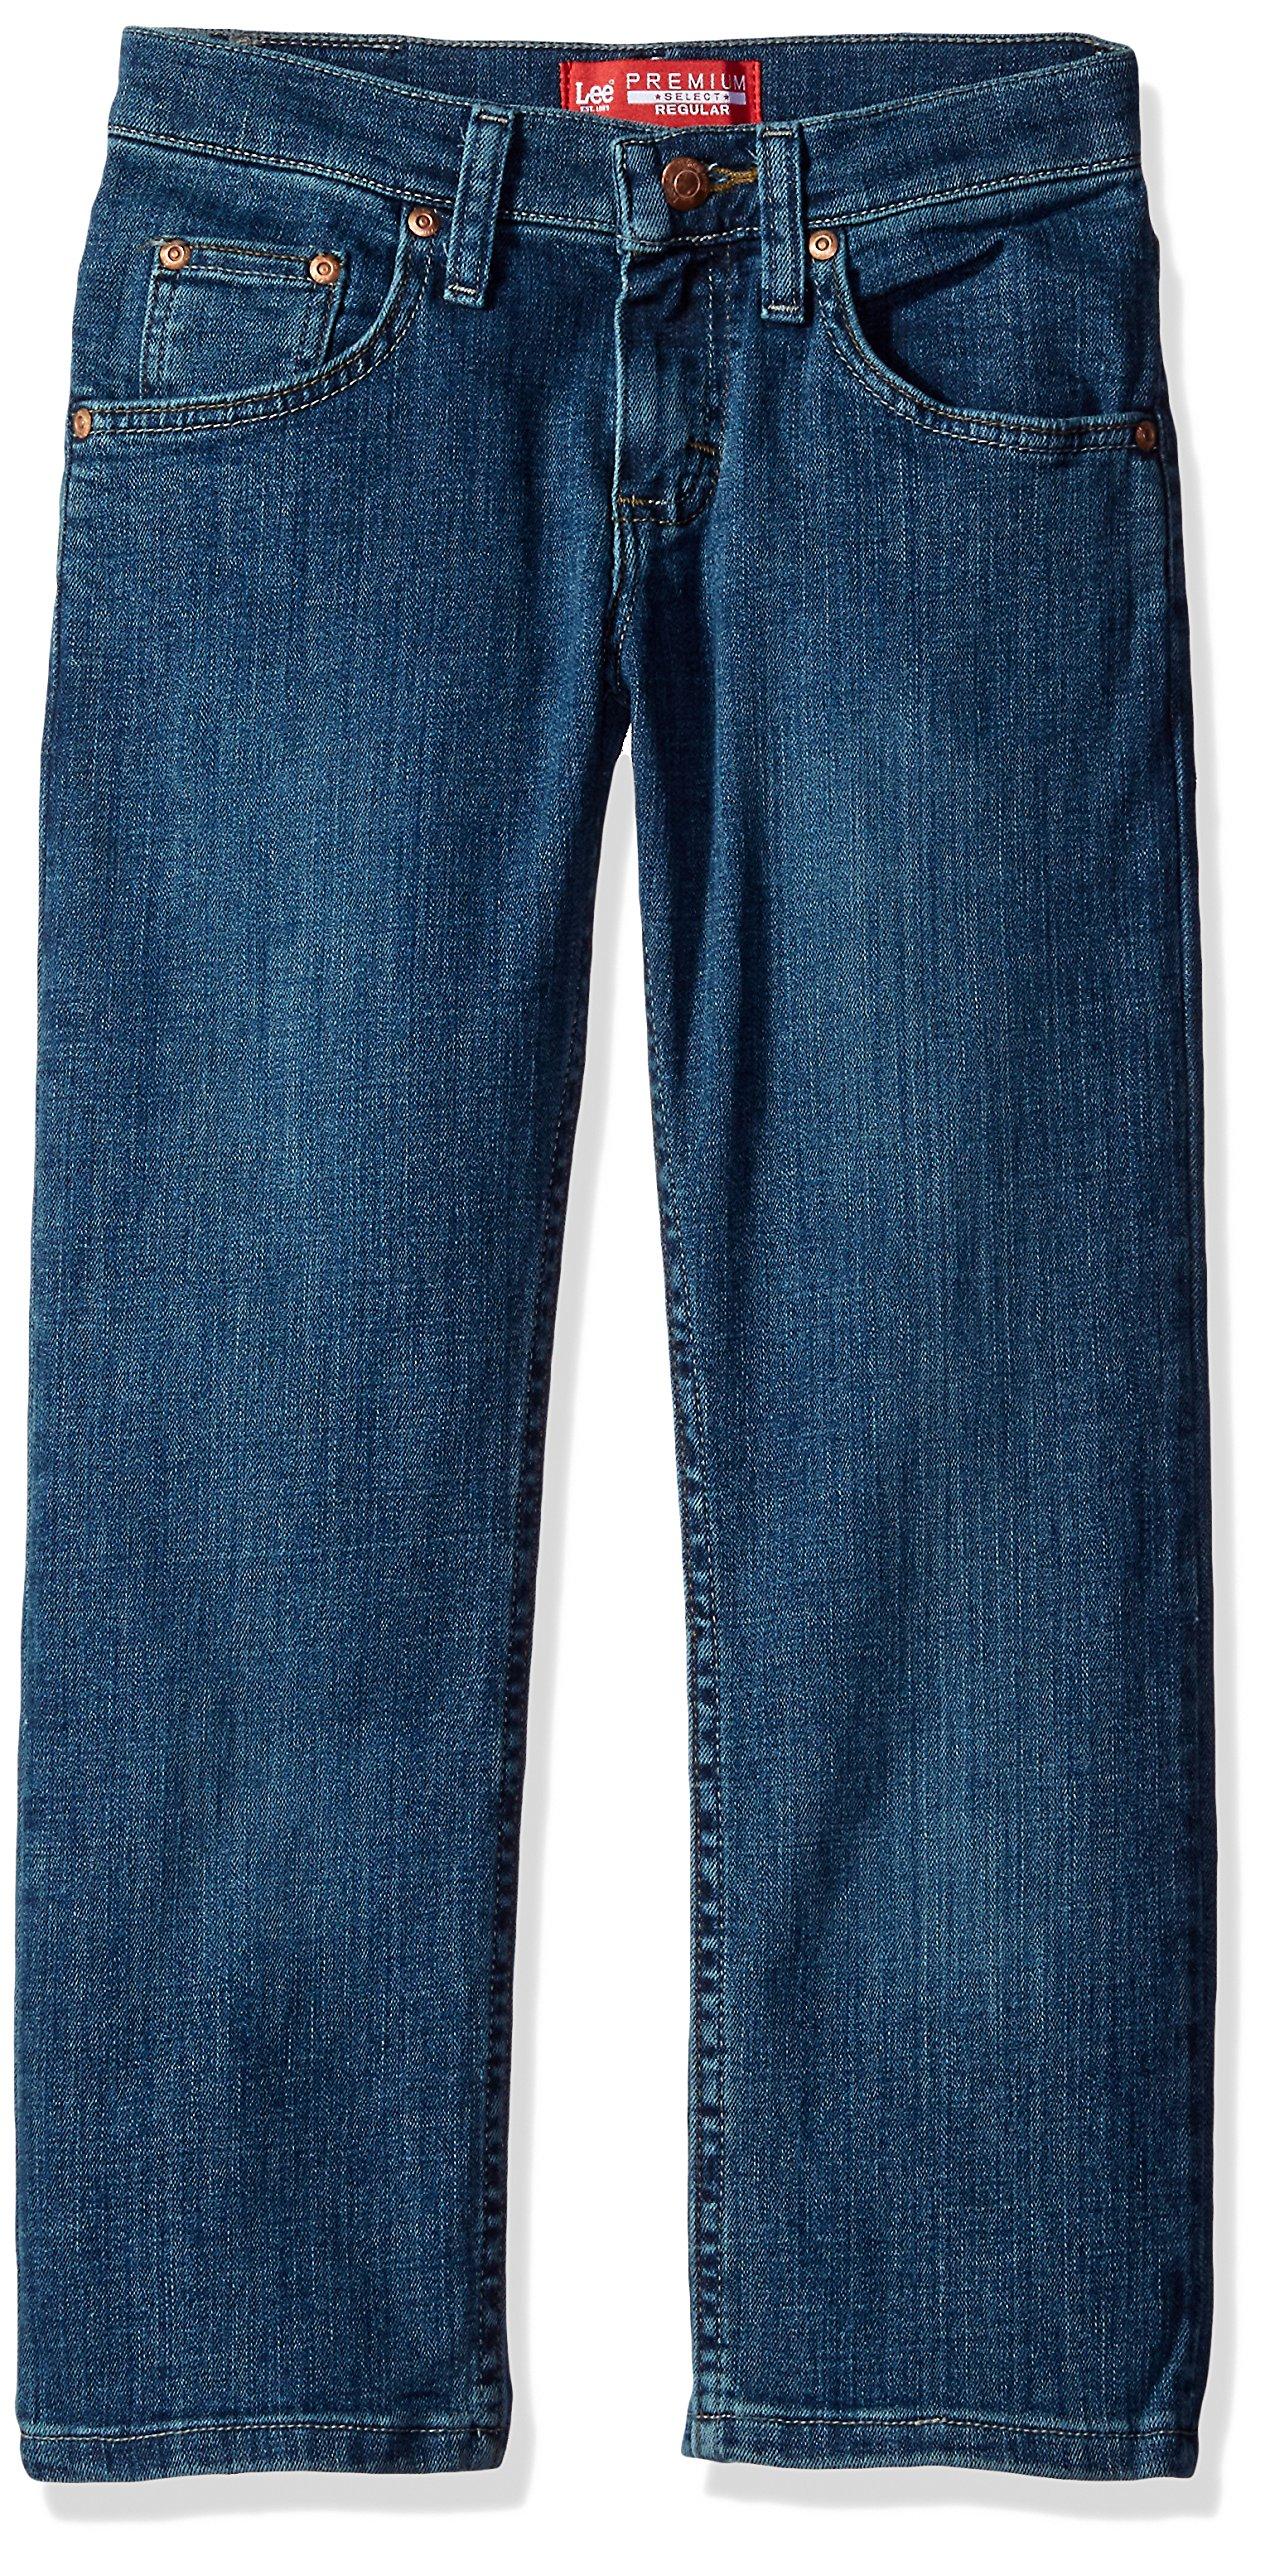 Lee Boys' Premium Select Fit Straight Leg Jeans, Dawson Handsand, 14 Regular